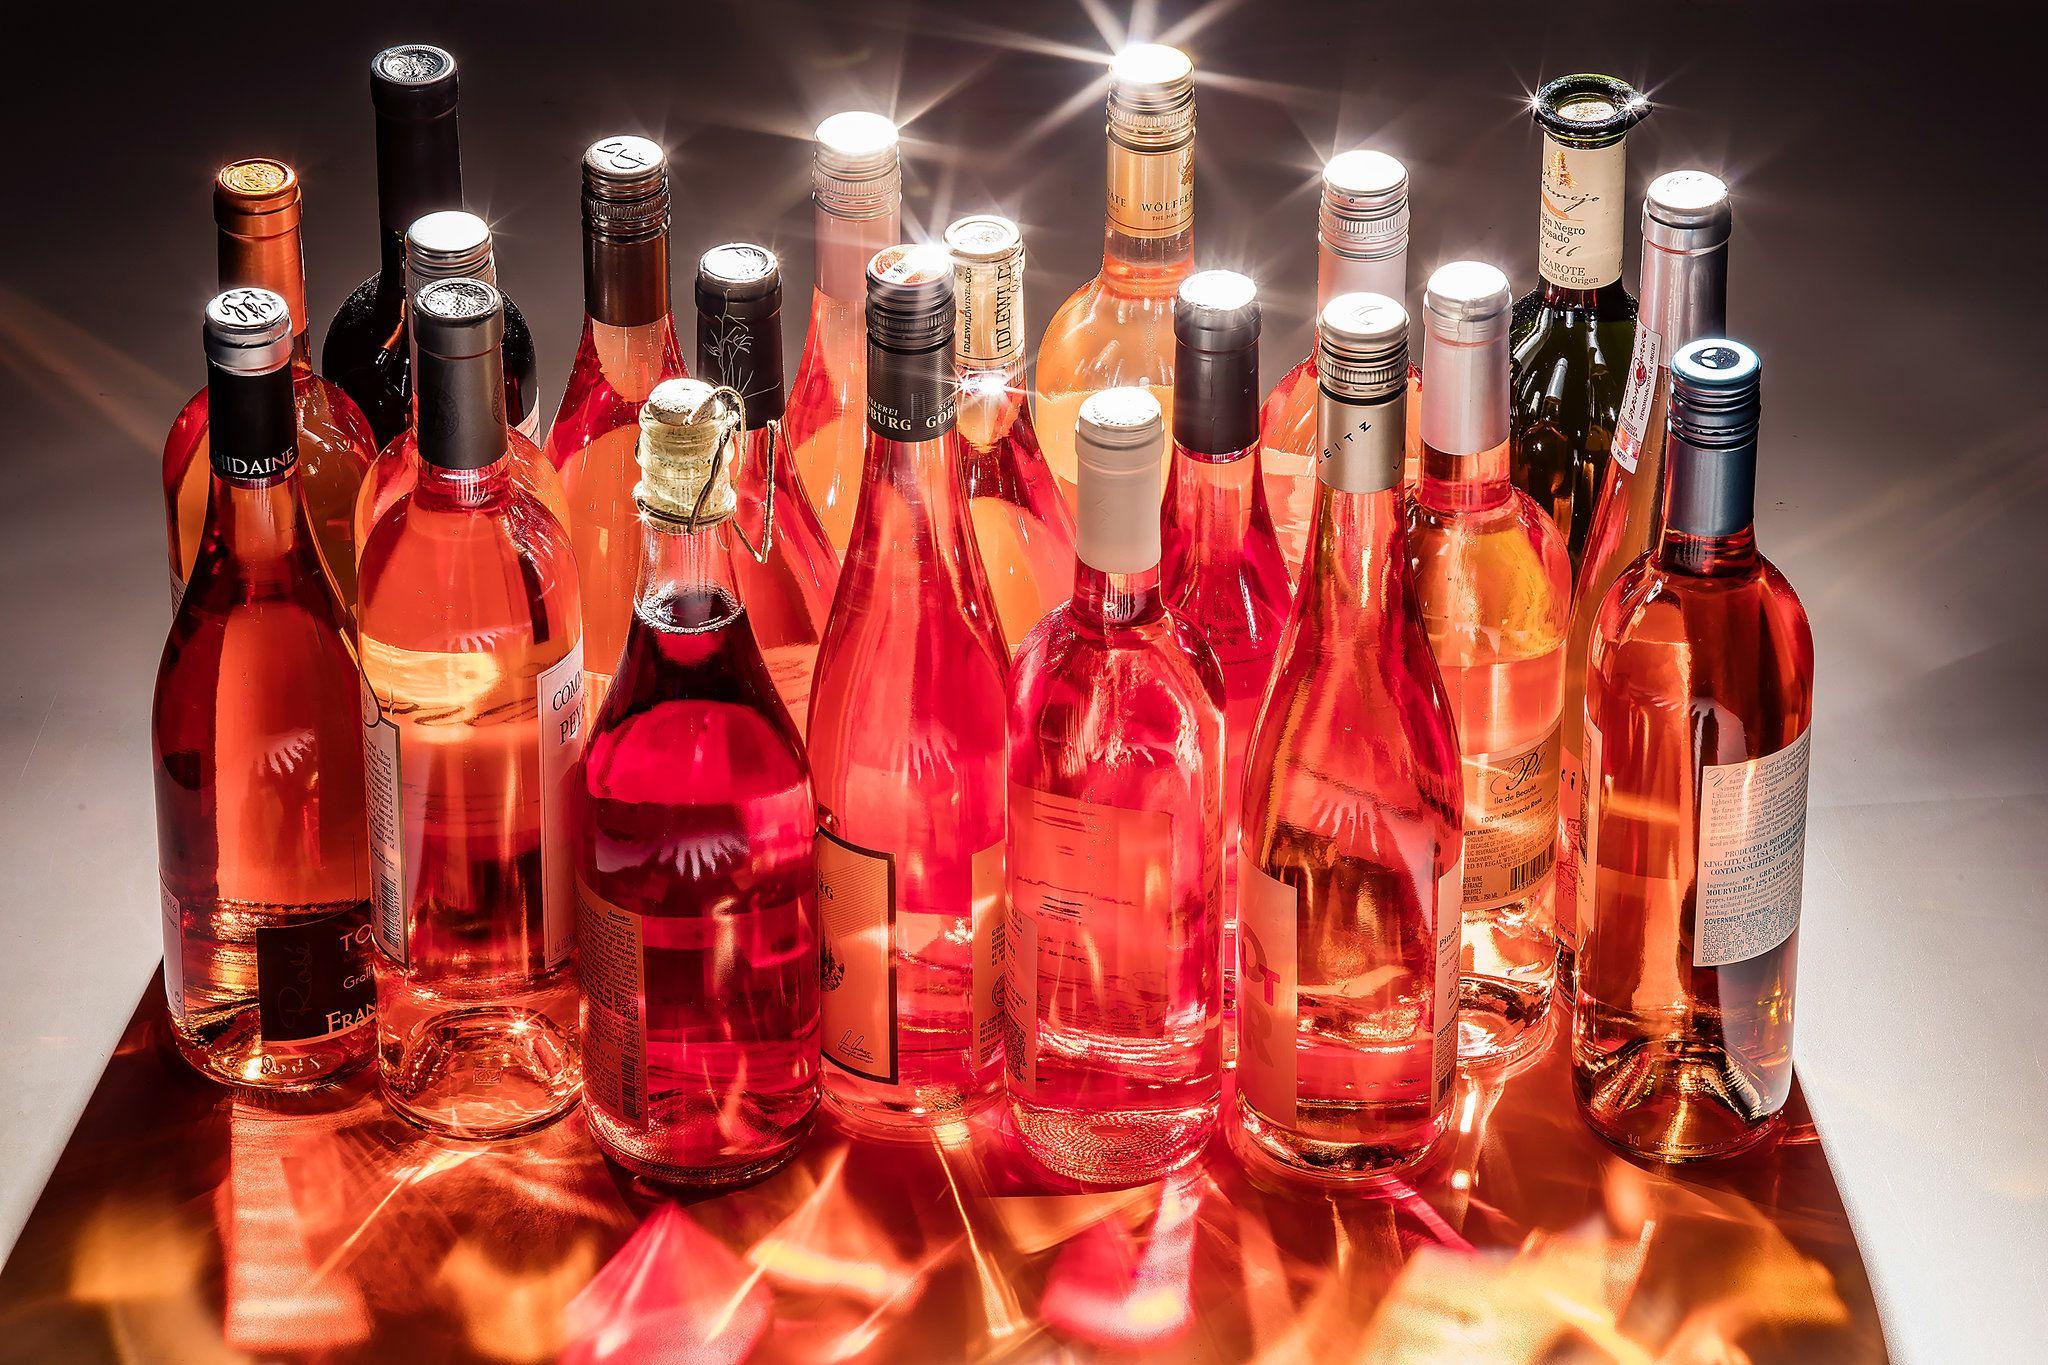 20 Wines Under 20 The Savory Side Of Rose Wine Rose Wine Wine Tasting